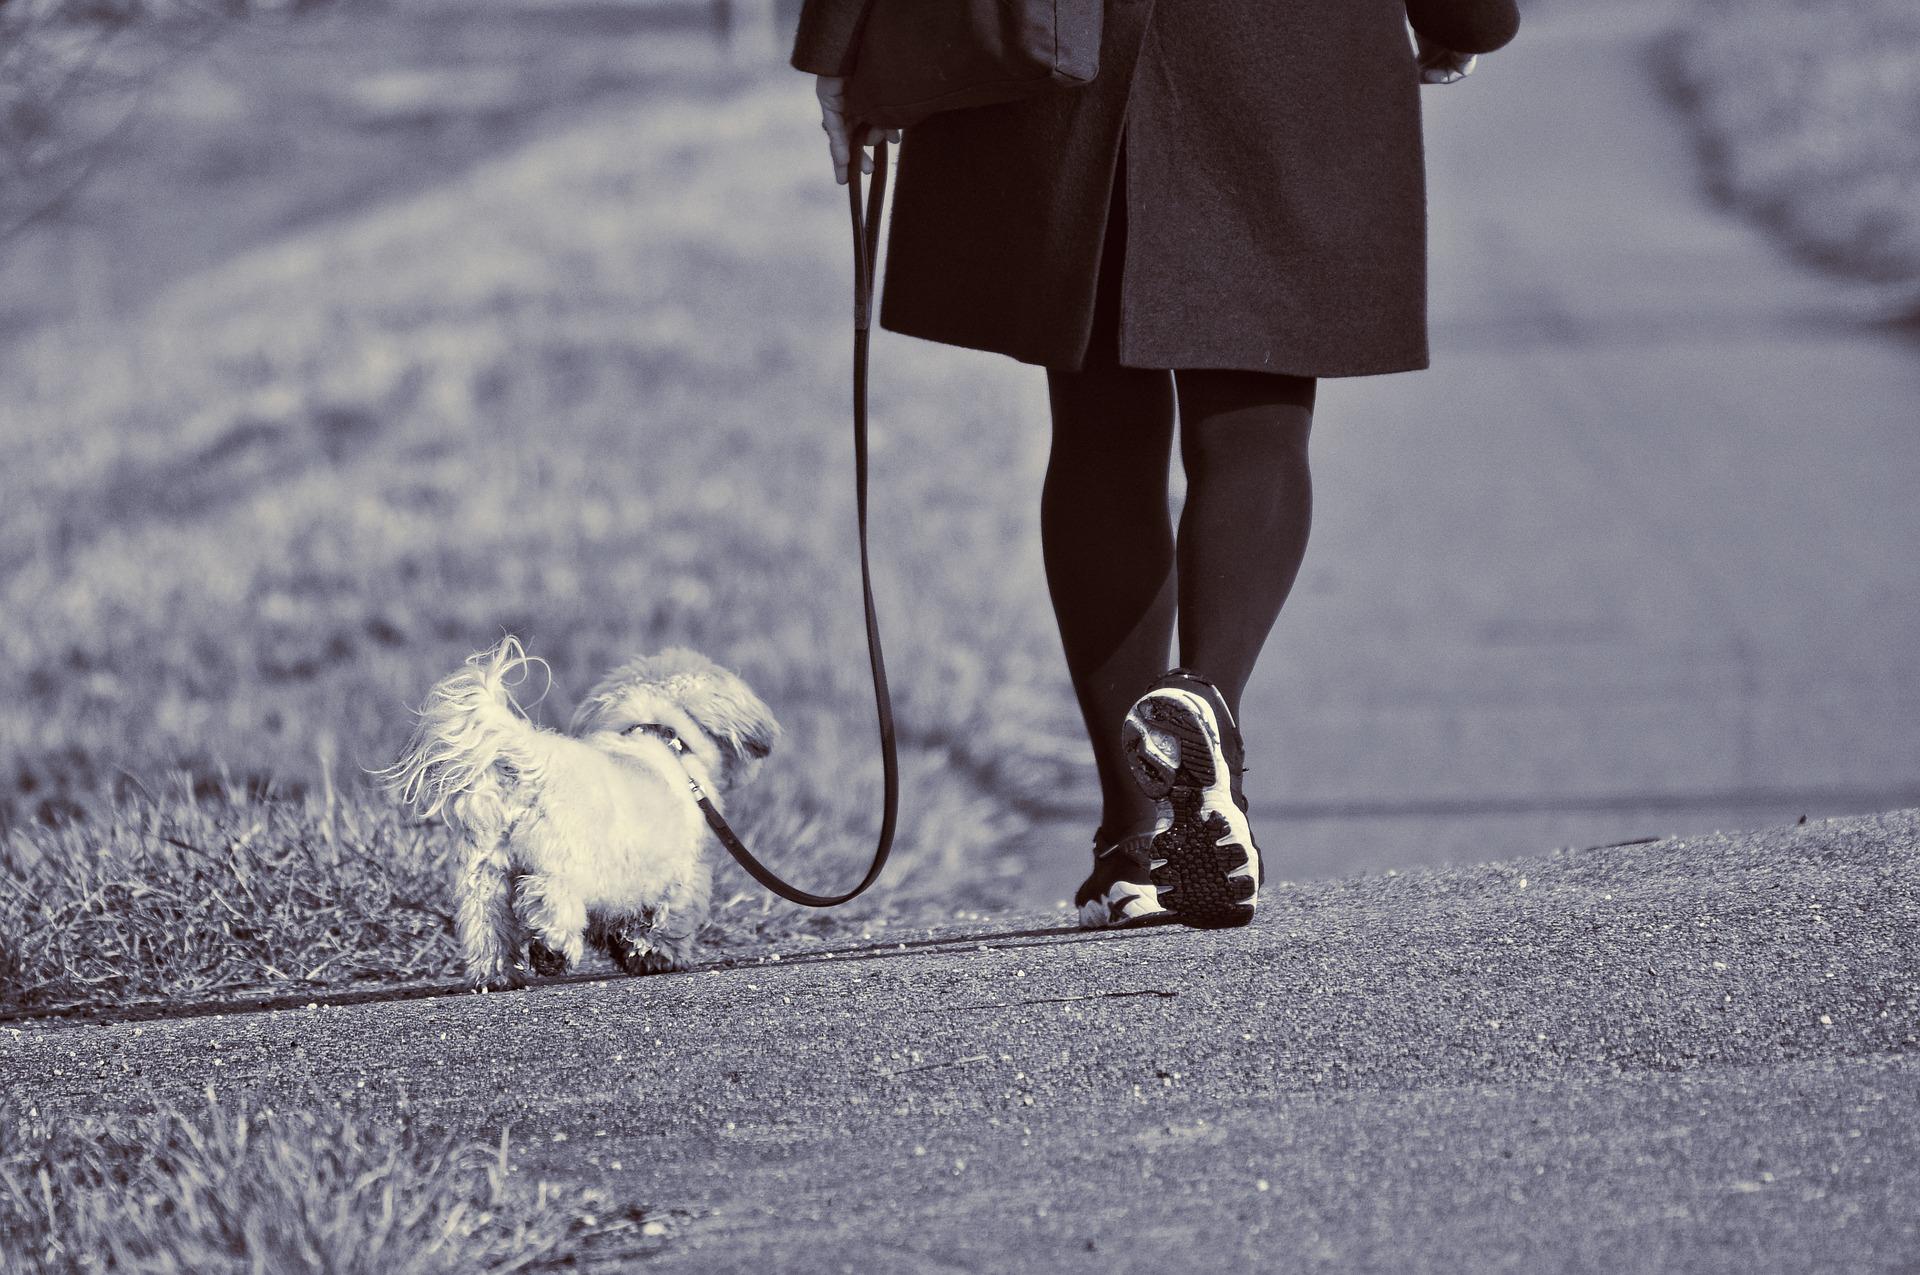 curiosità sui cani al guinzaglio